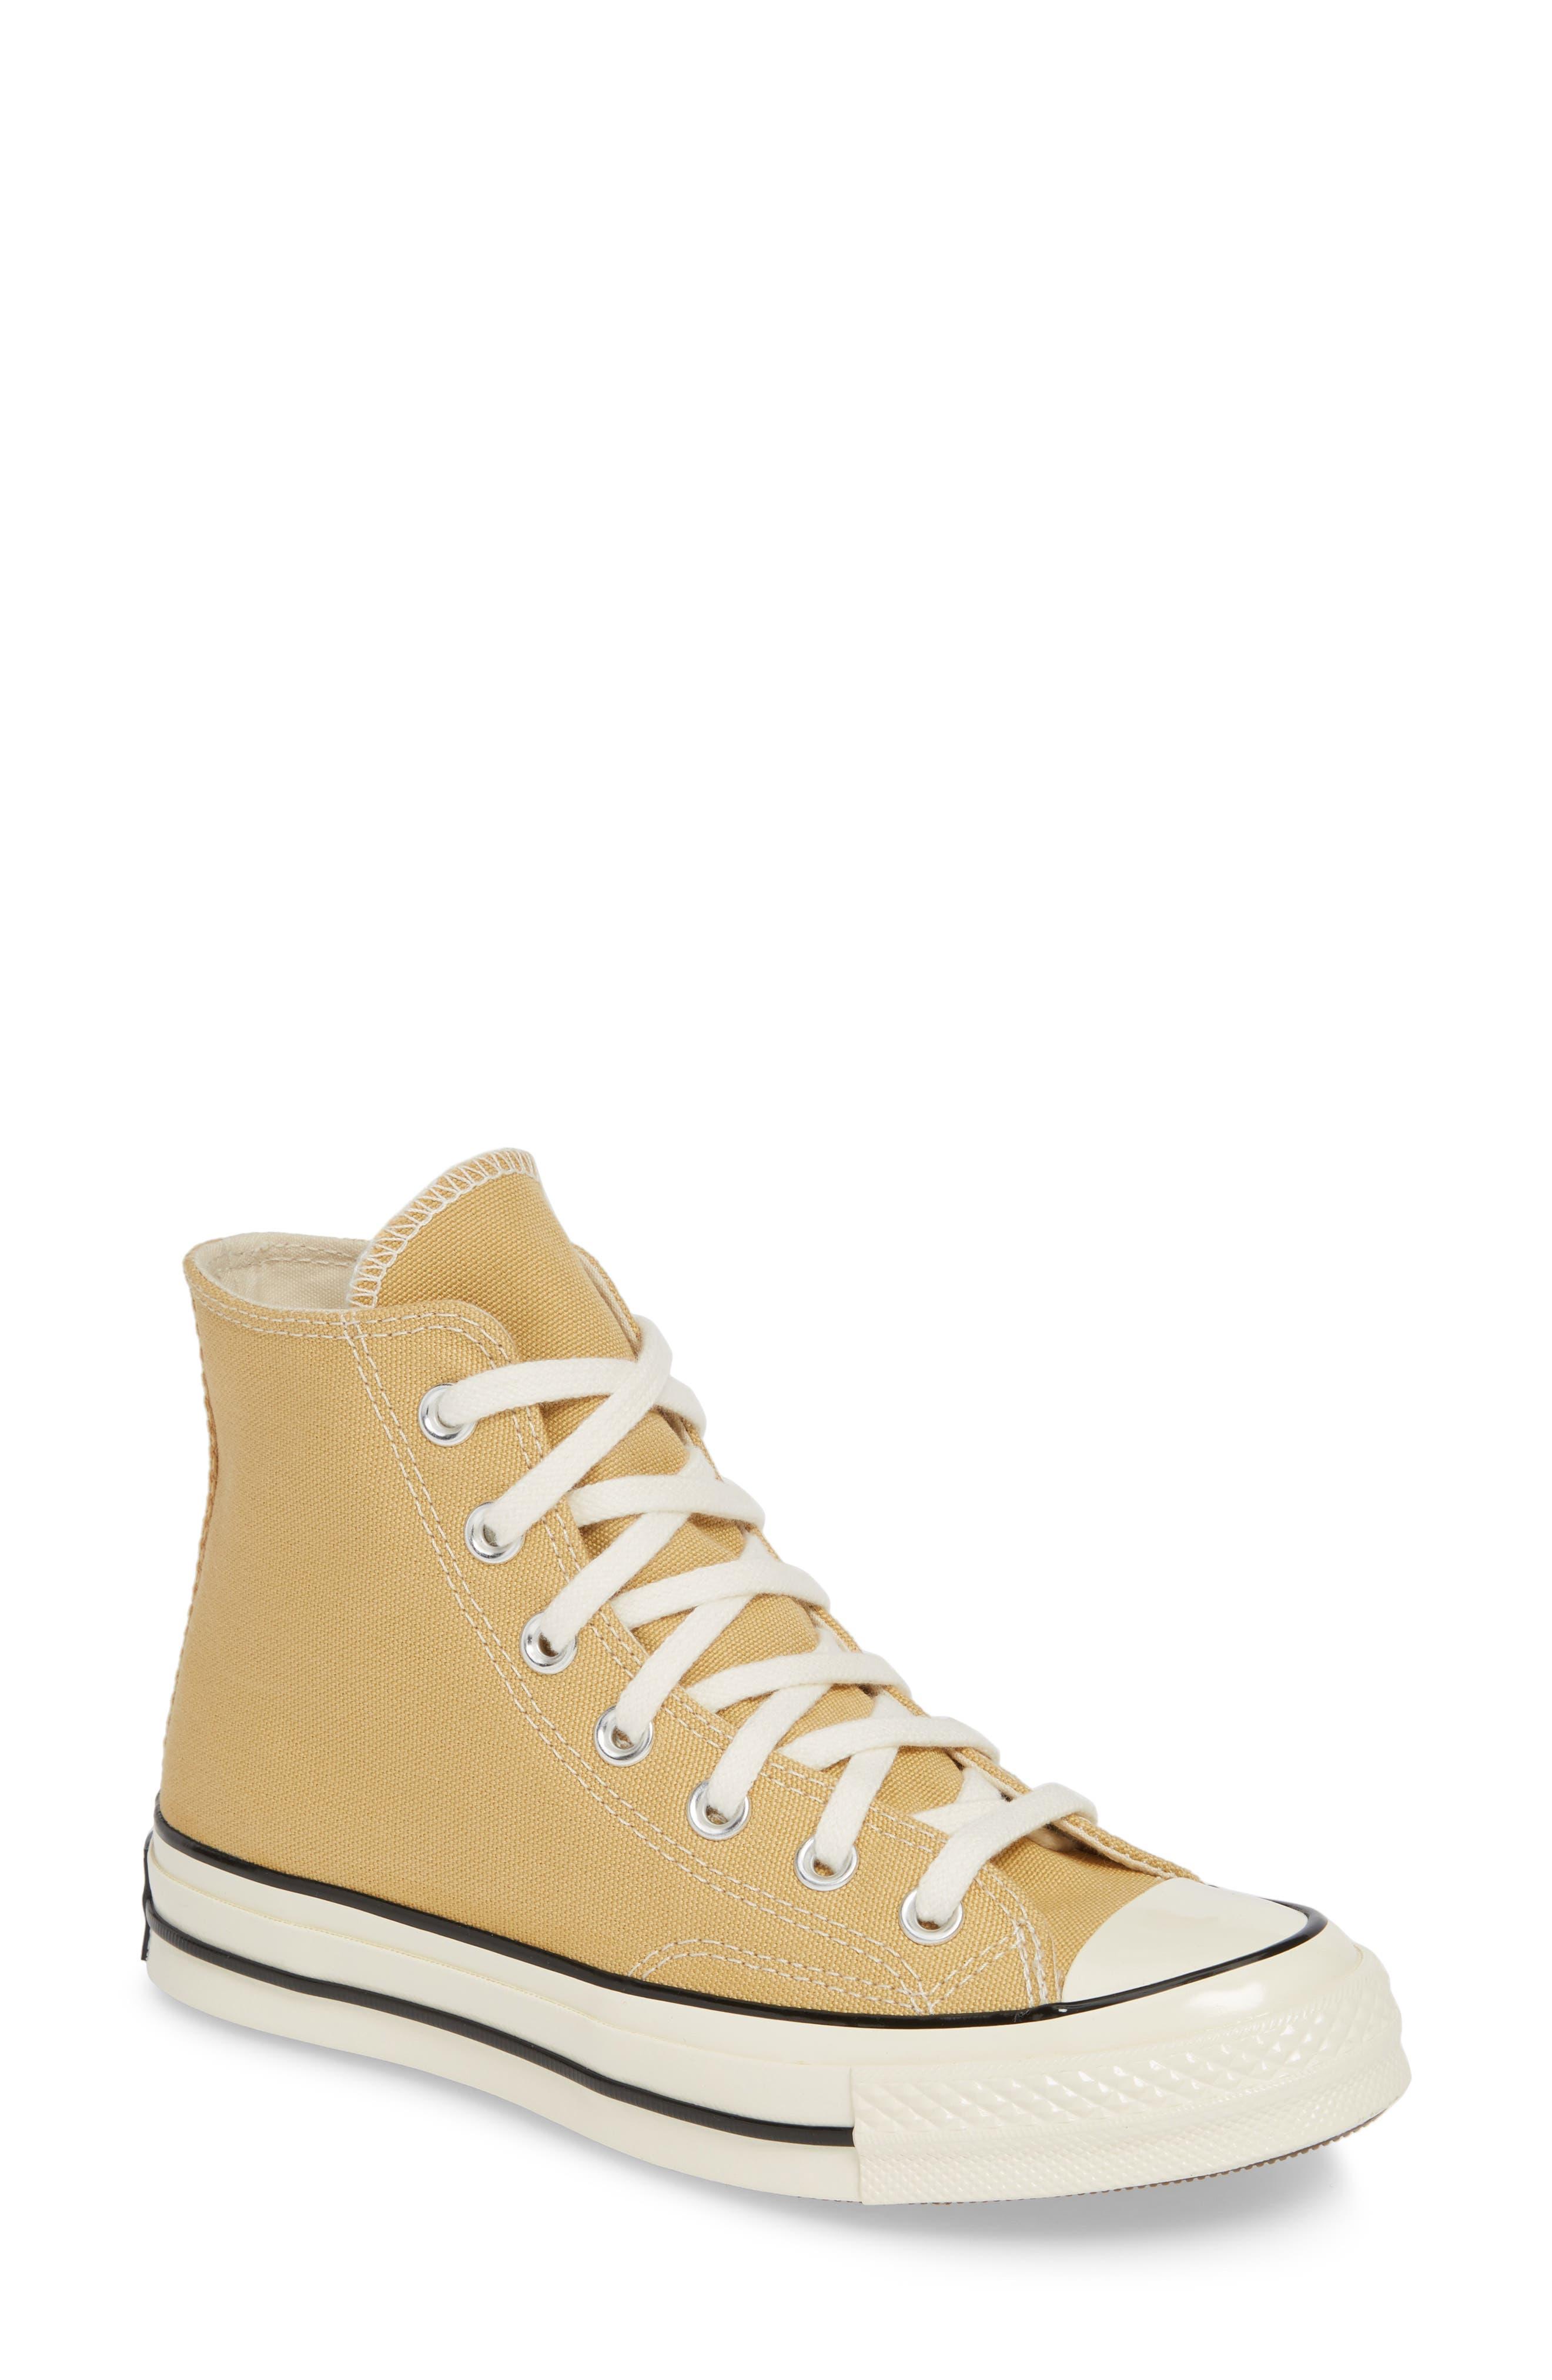 Converse Chuck Taylor All Star 70 High Top Sneaker- Metallic